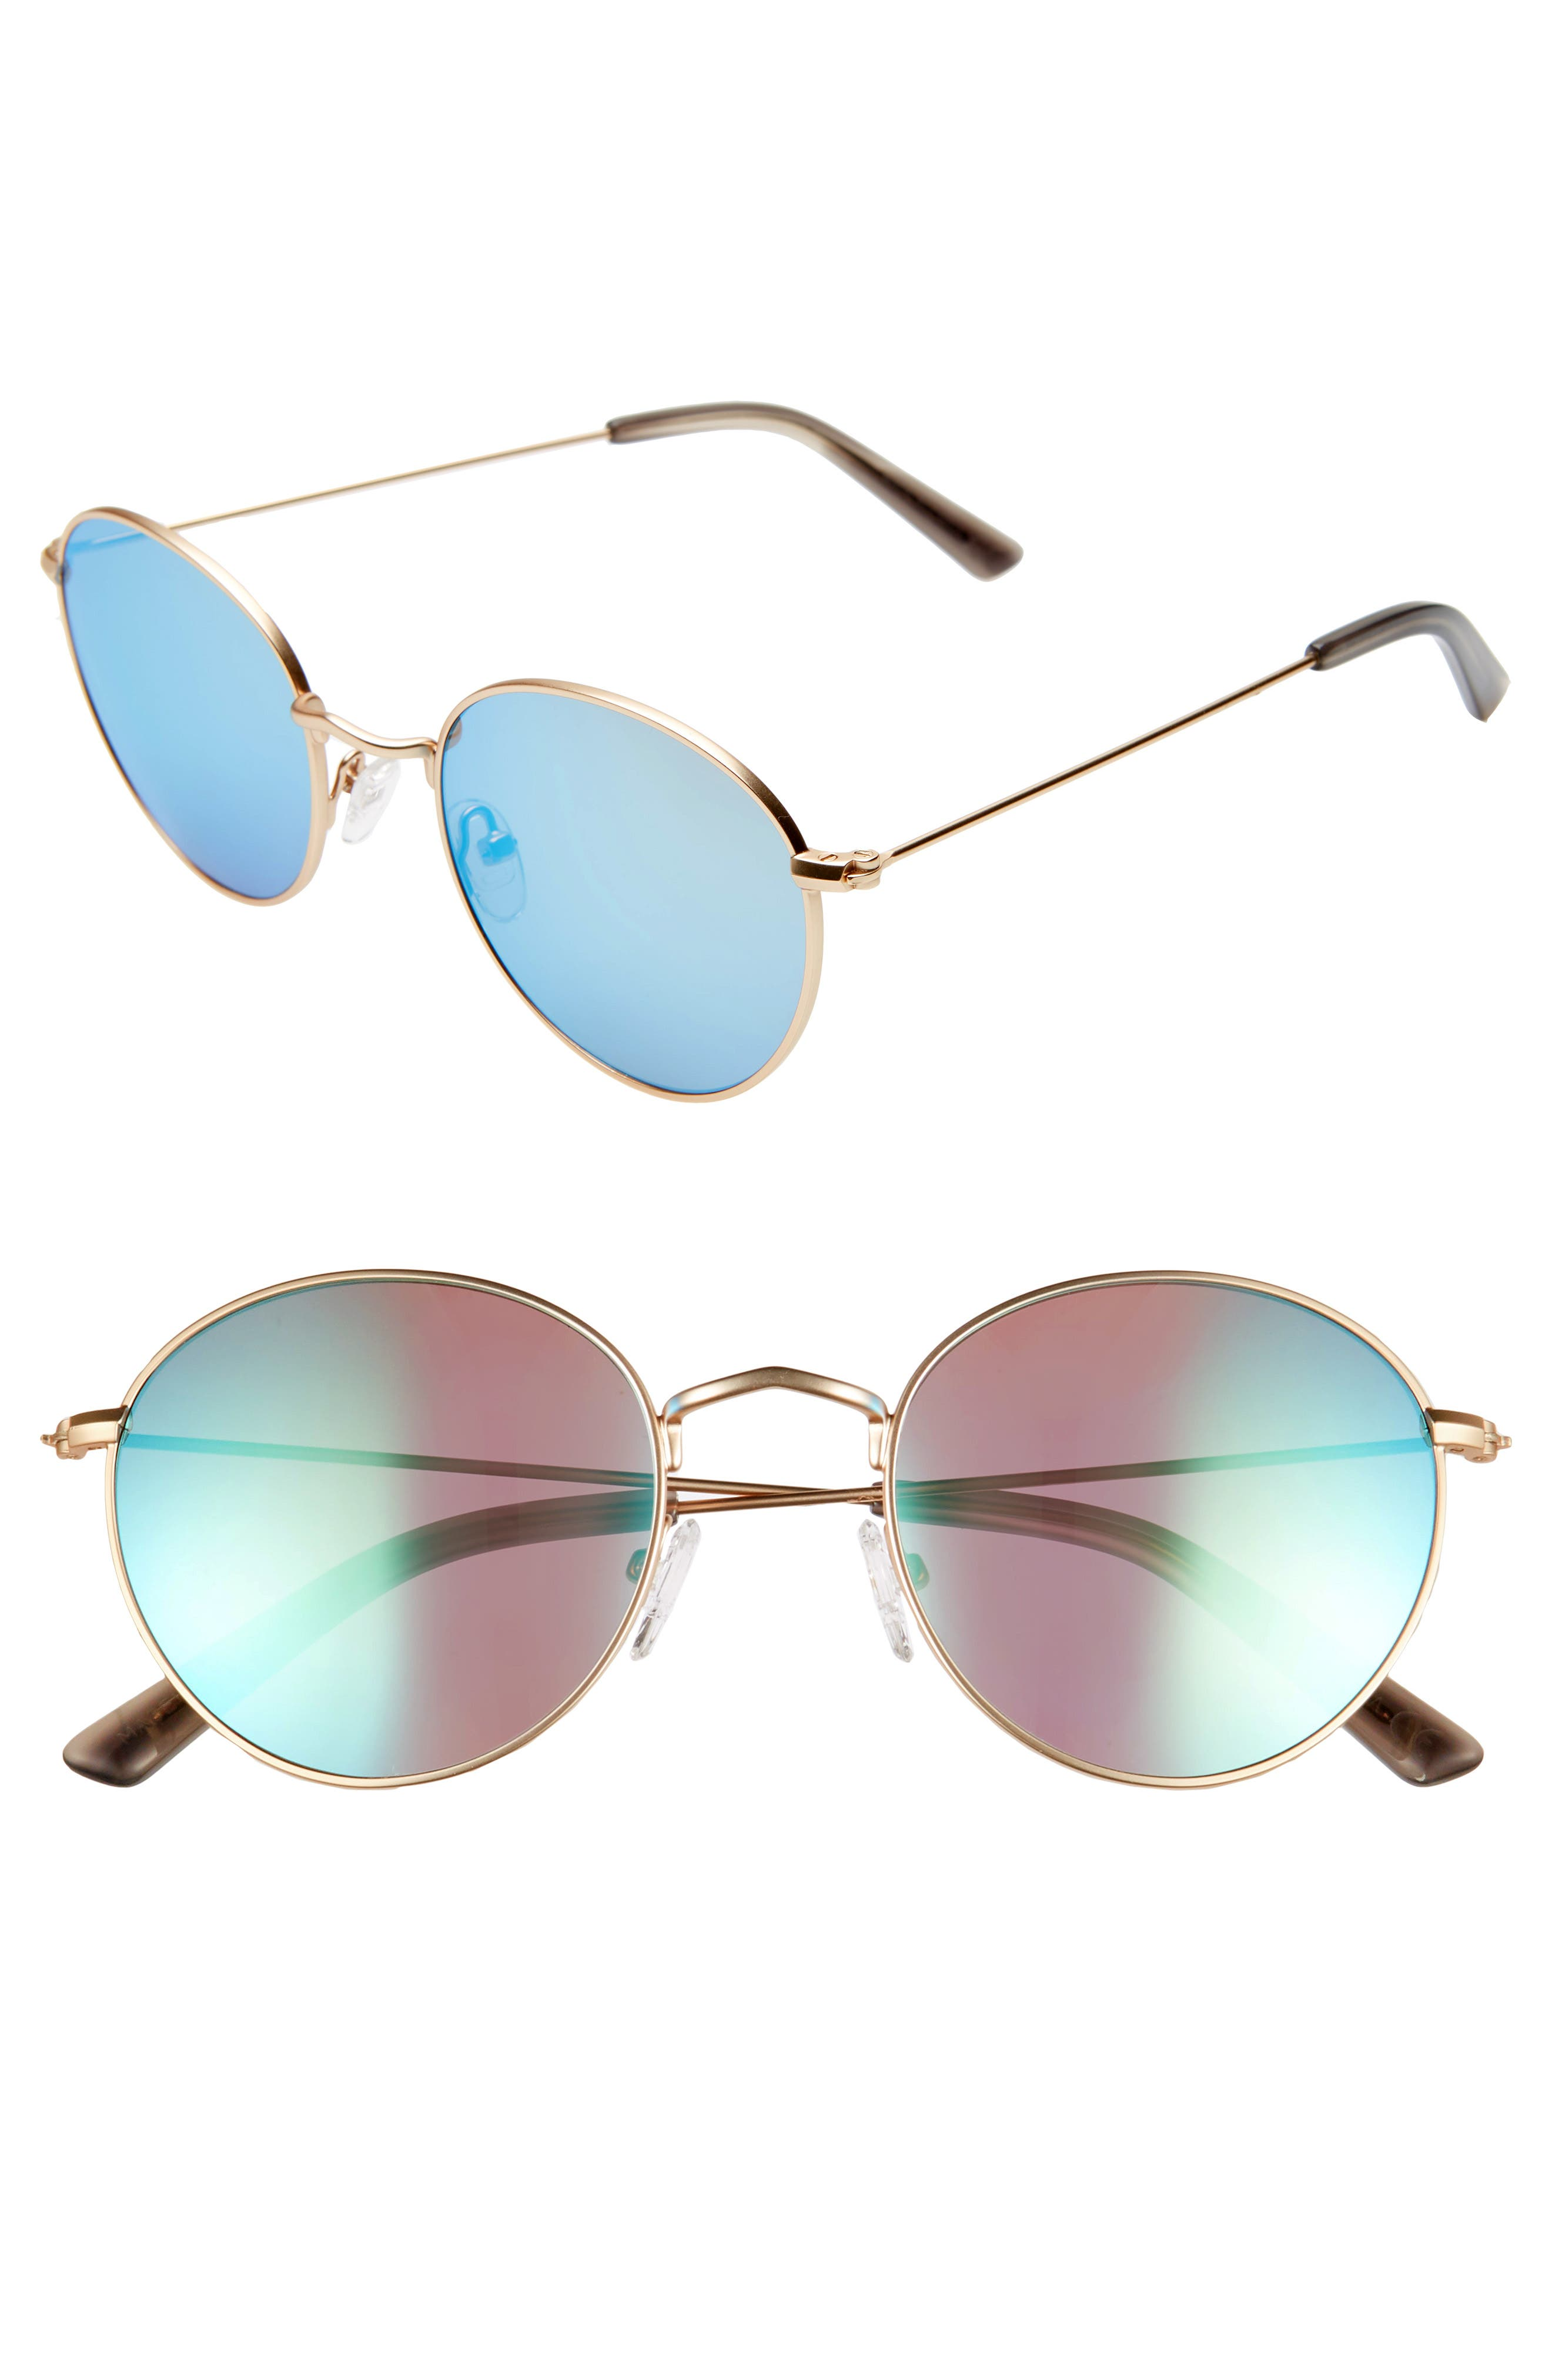 852363fab1 Madewell Fest 50Mm Aviator Sunglasses - Gold  Blue